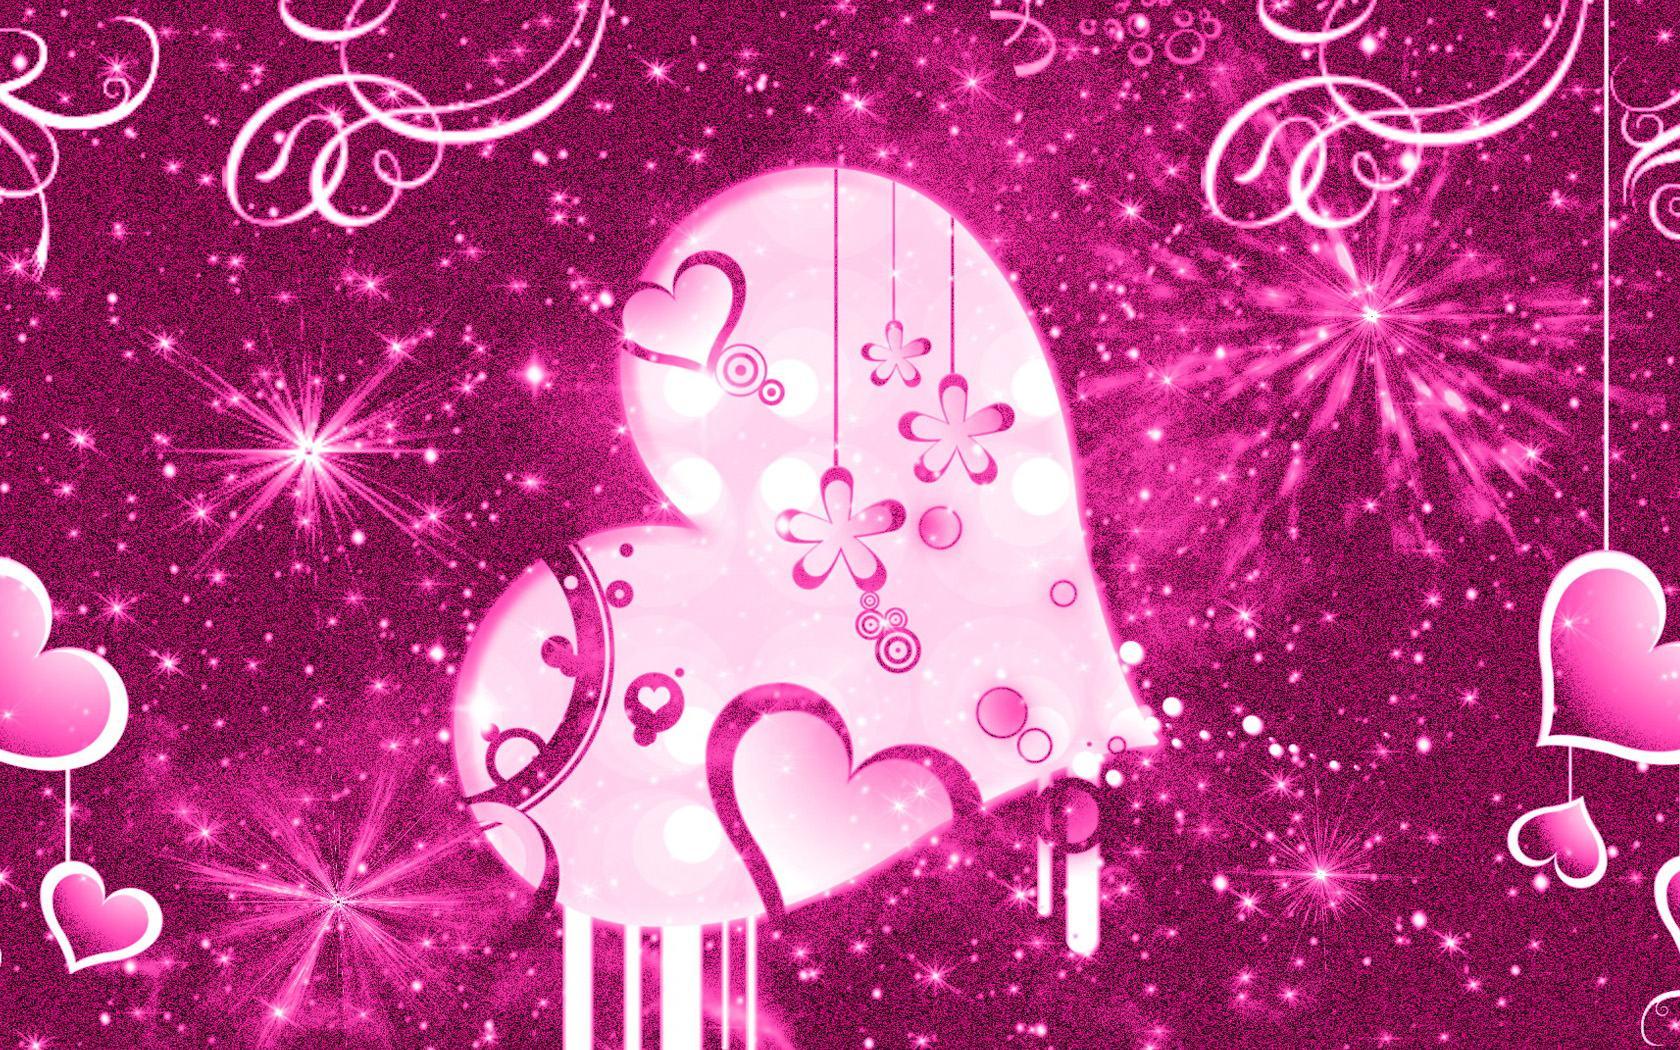 Wallpaper download girly - Cool Girly Wallpaper Pin Pink Hd Wallpapers Cute